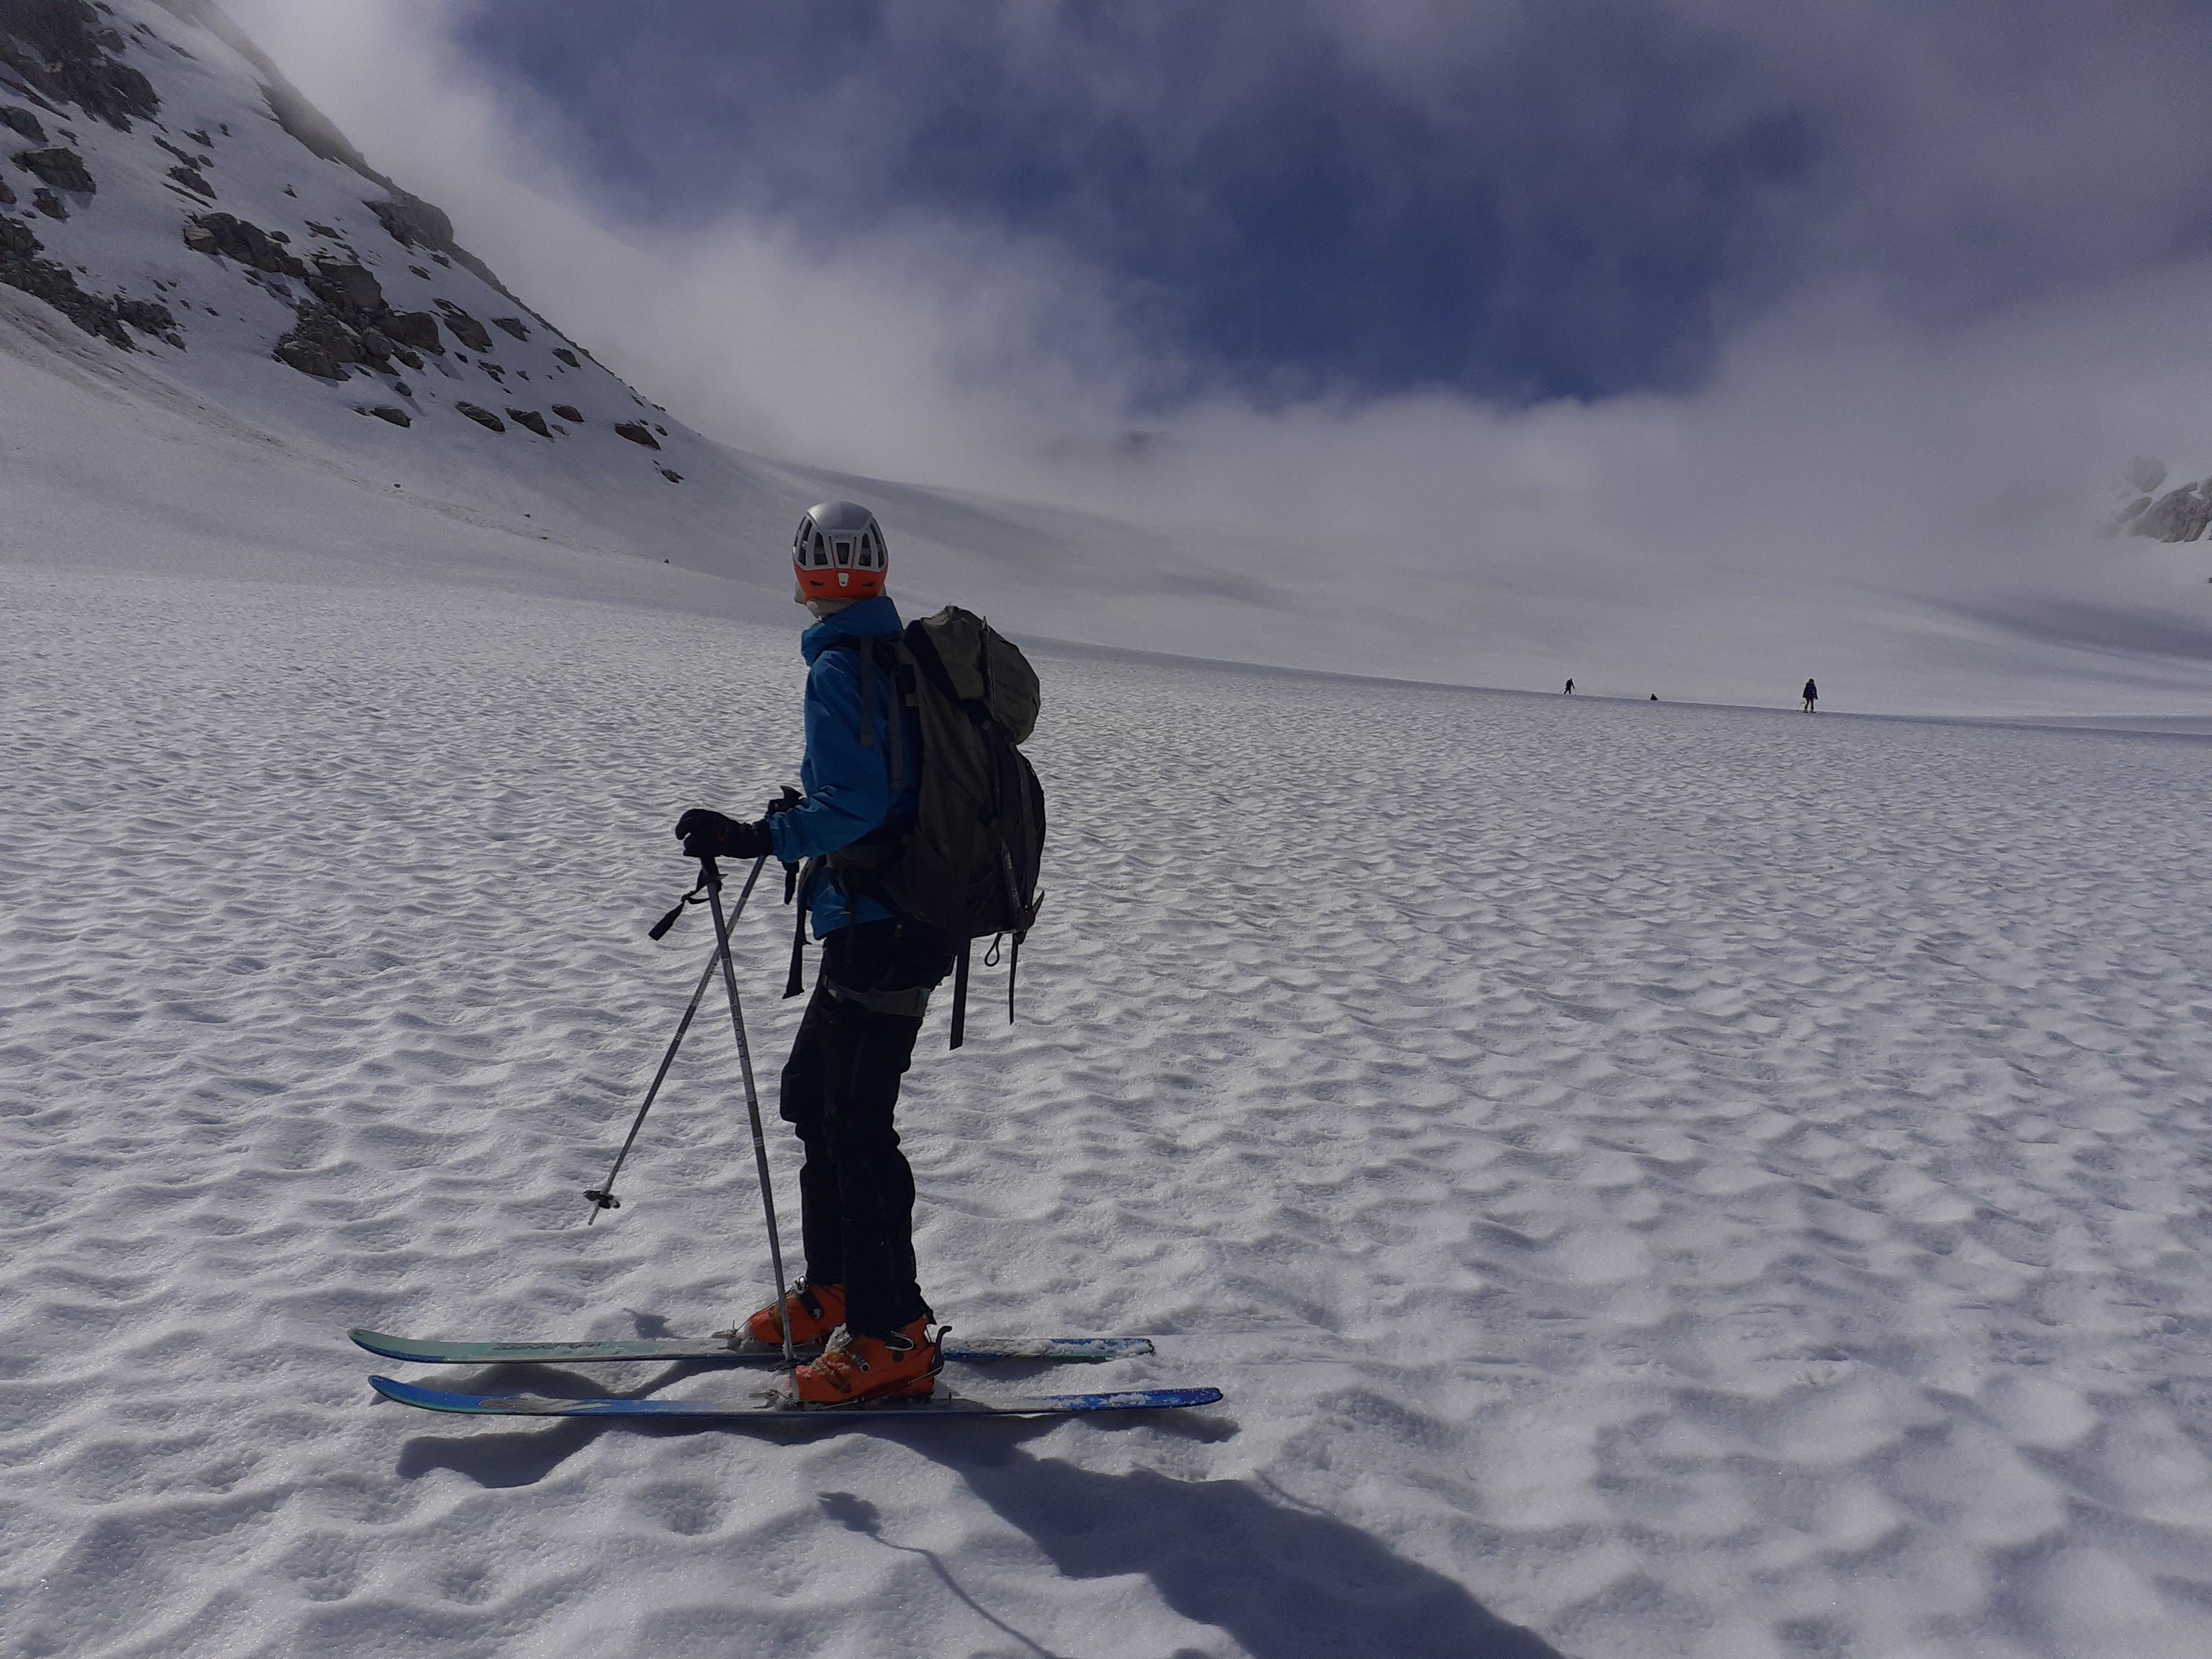 Good skiing on the glacier.